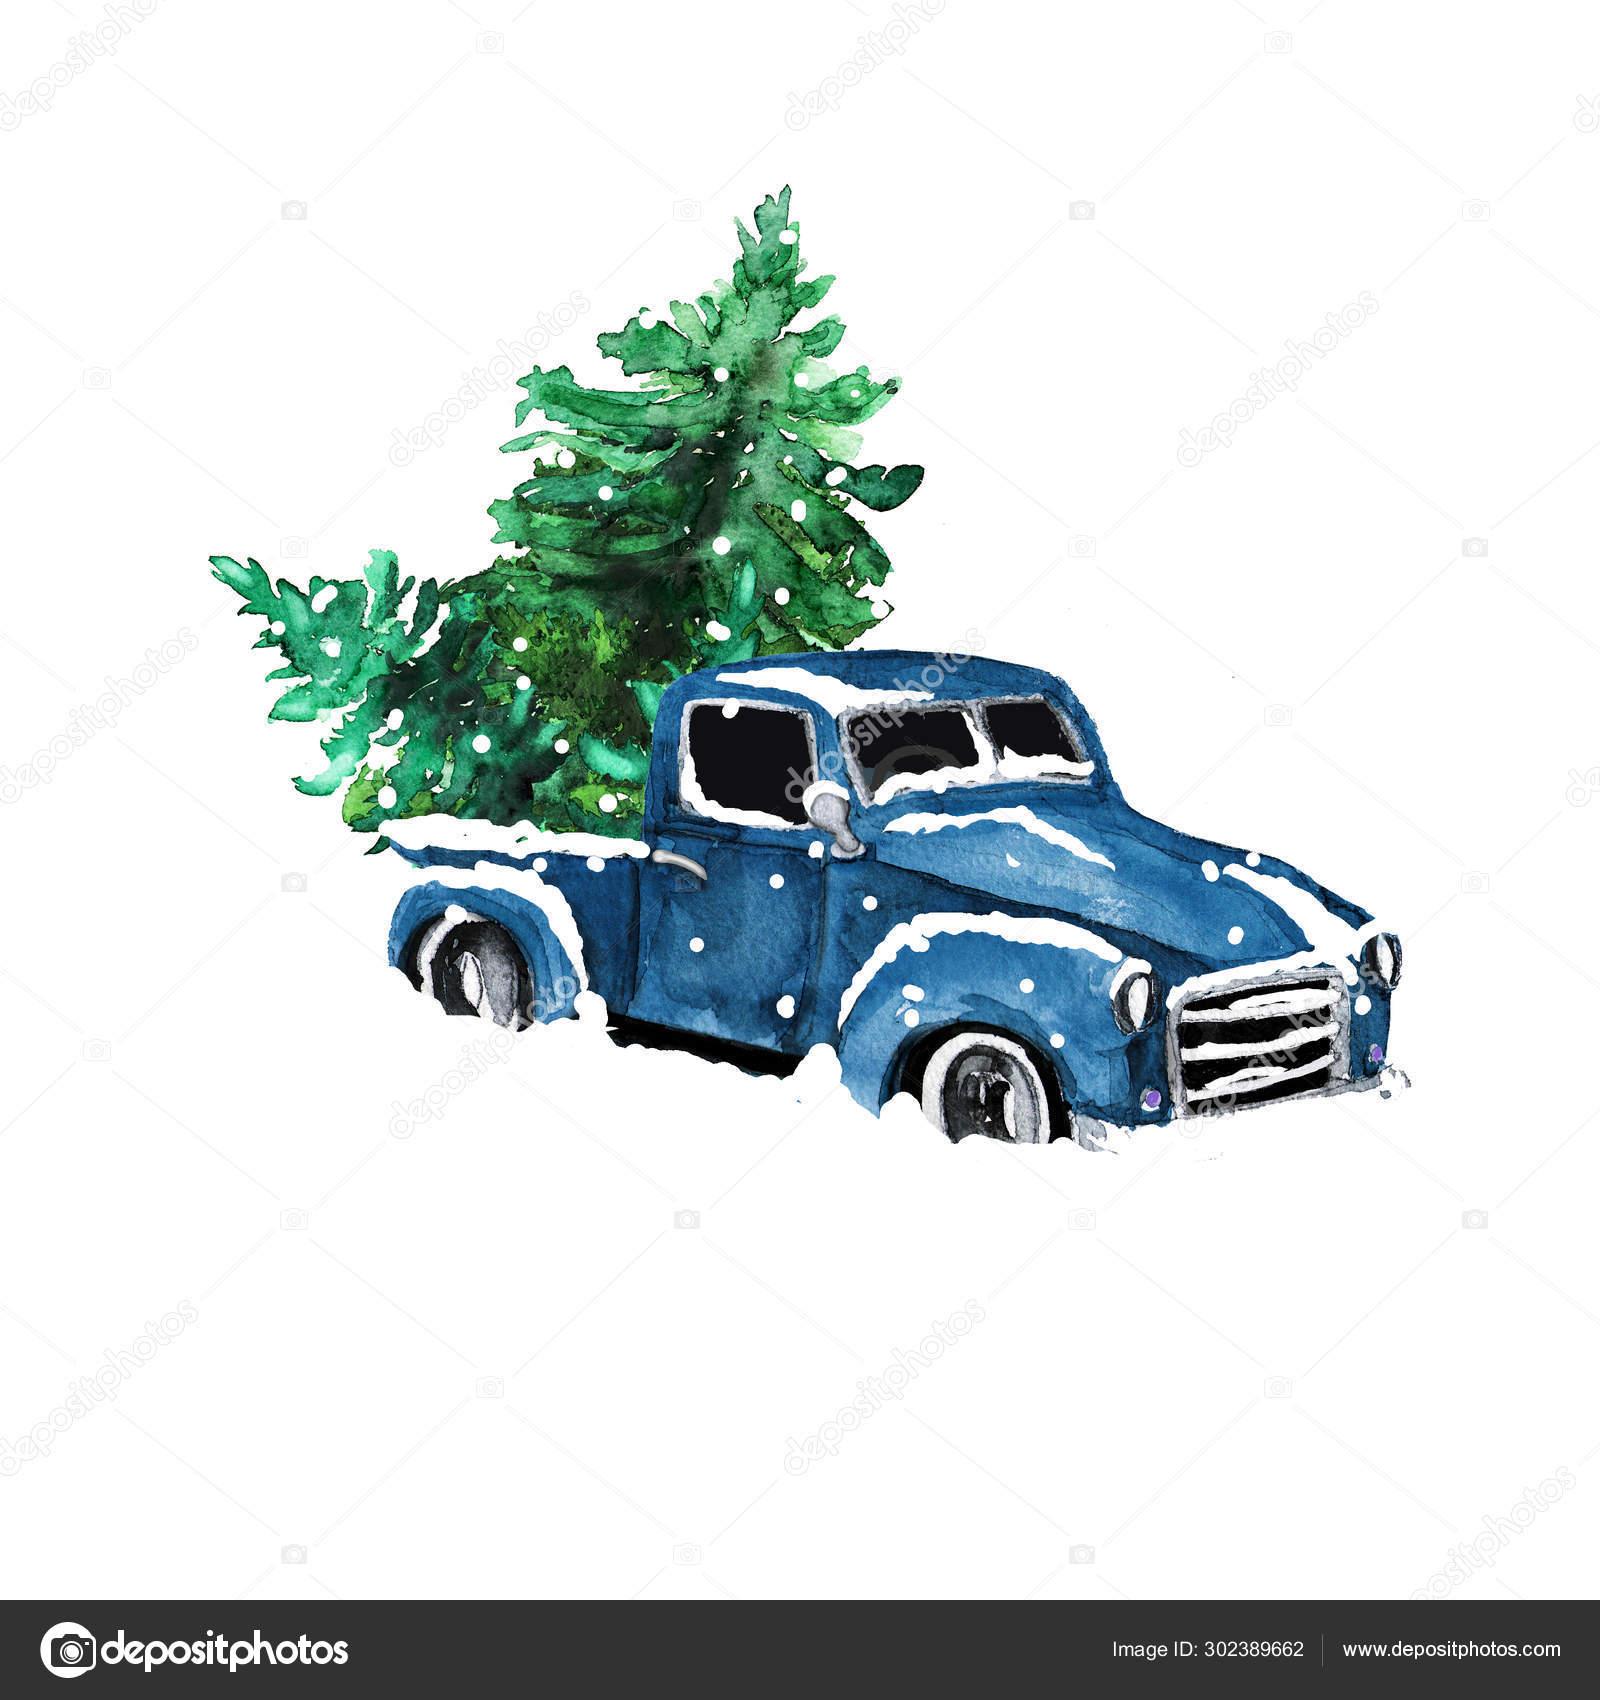 Watercolor Hand Drawn Artistic Colorful Retro Vintage Car Christmas Tree Stock Photo C Nuarevik 302389662